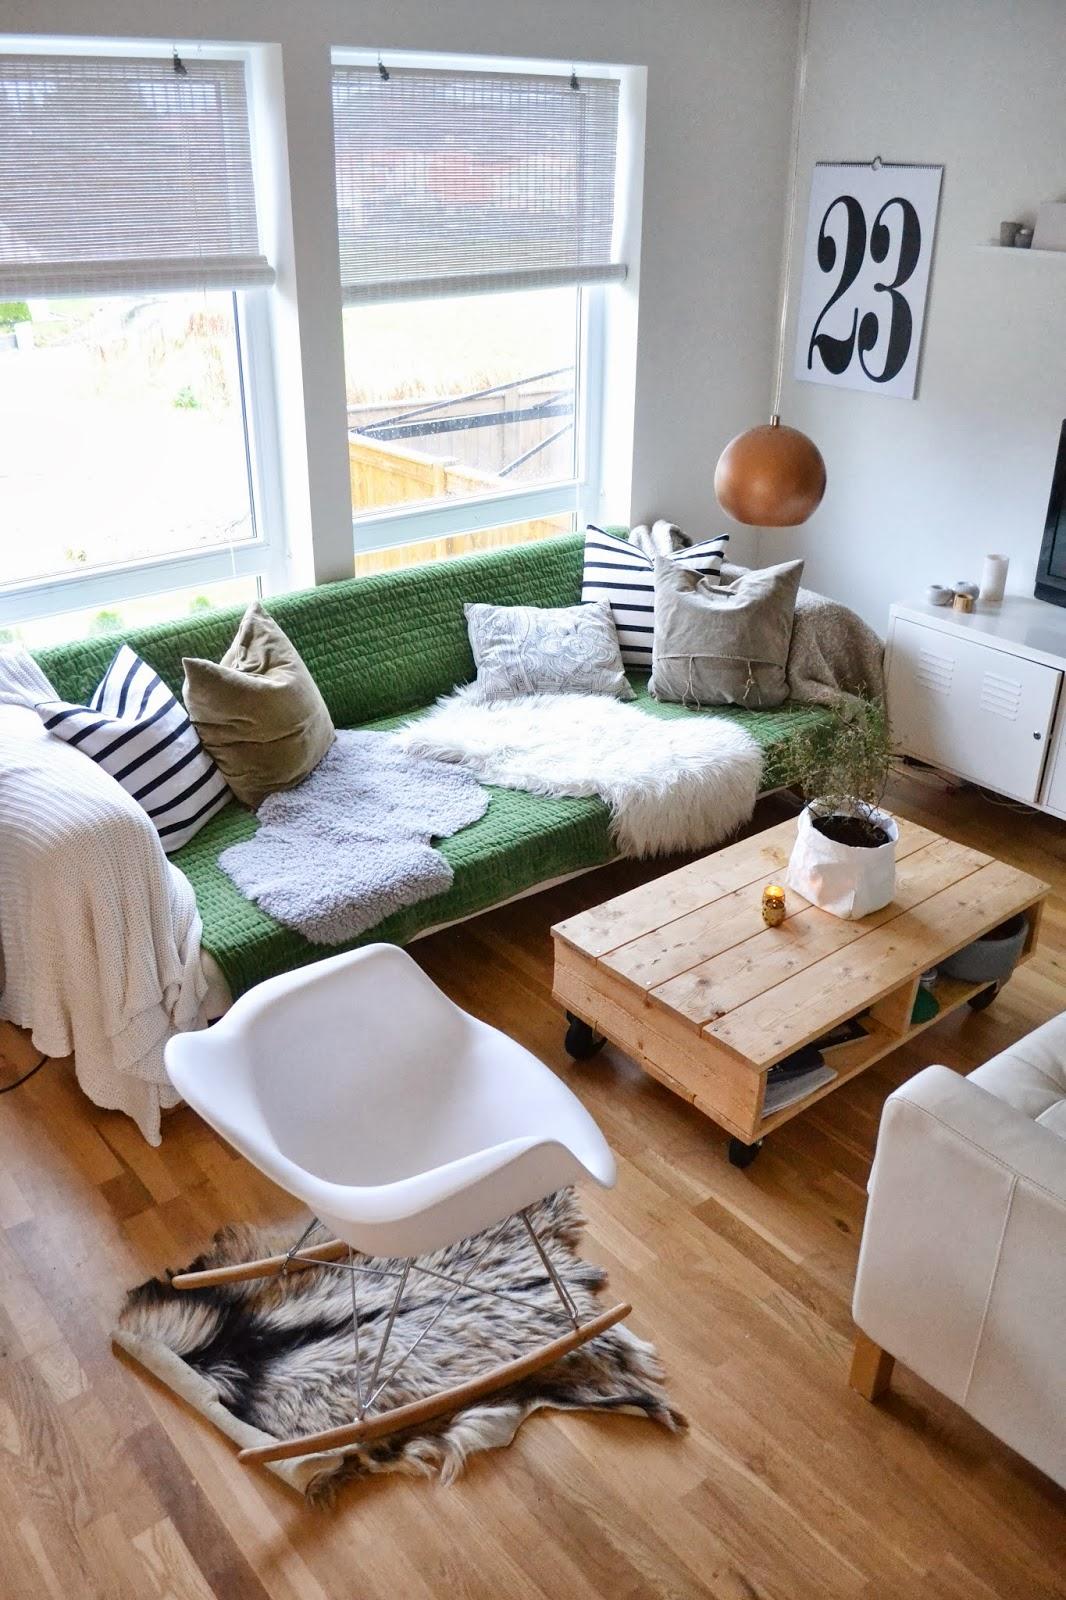 Silje vaniljeis: grønn sofa!?